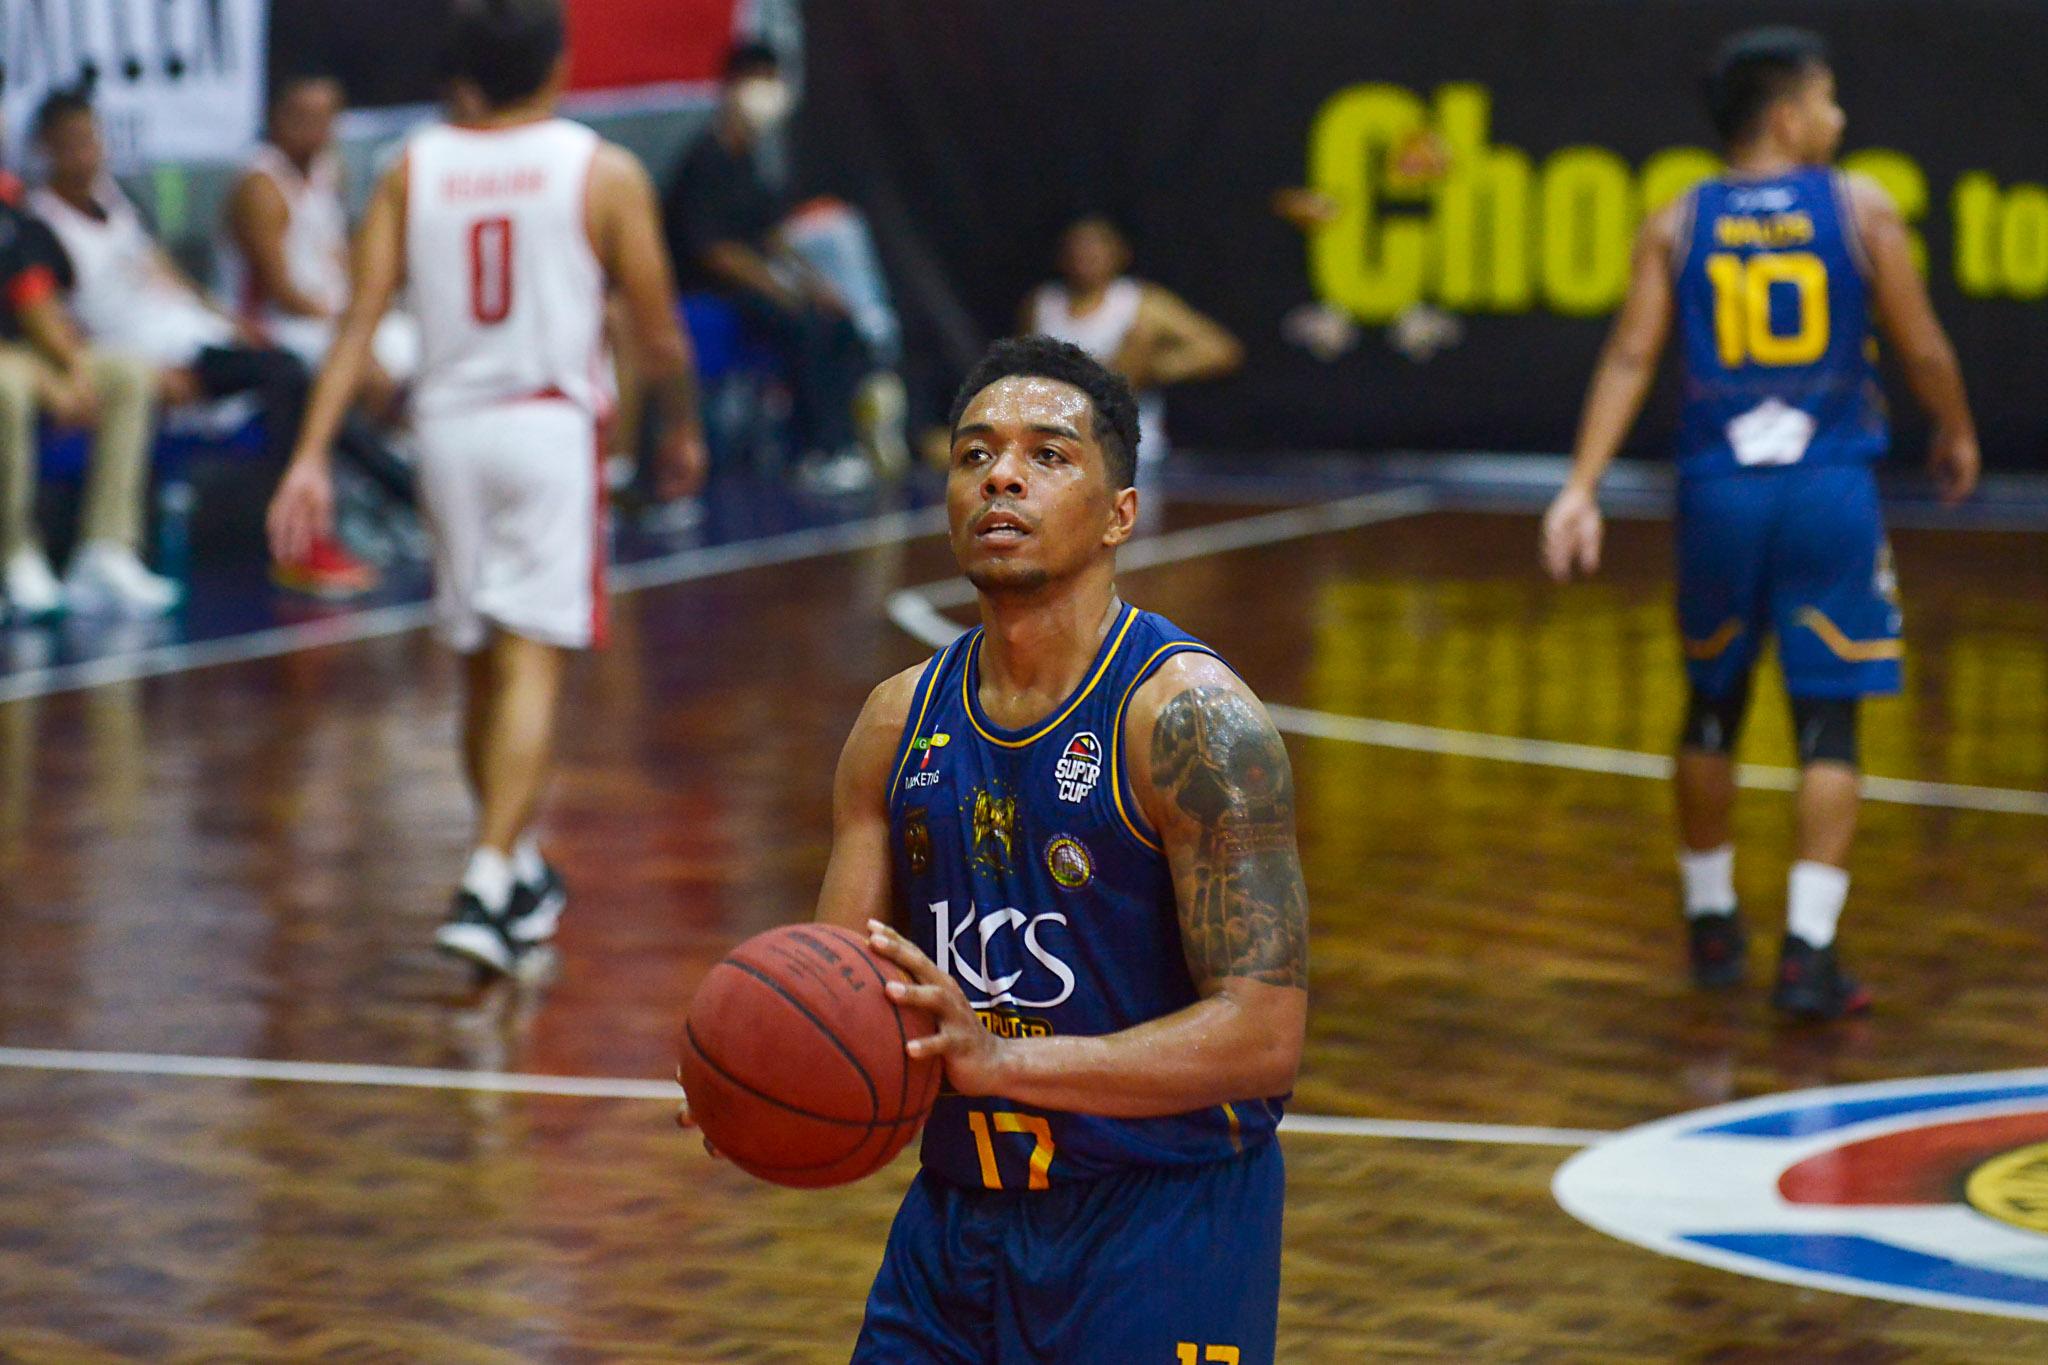 2021-Chooks-to-Go-VisMin-Cup-Dumaguete-vs-Mandaue-Ping-Exciminiano Gryann Mendoza grateful to Ping Exciminiano for pushing him in Mandaue Basketball News VisMin Super Cup  - philippine sports news